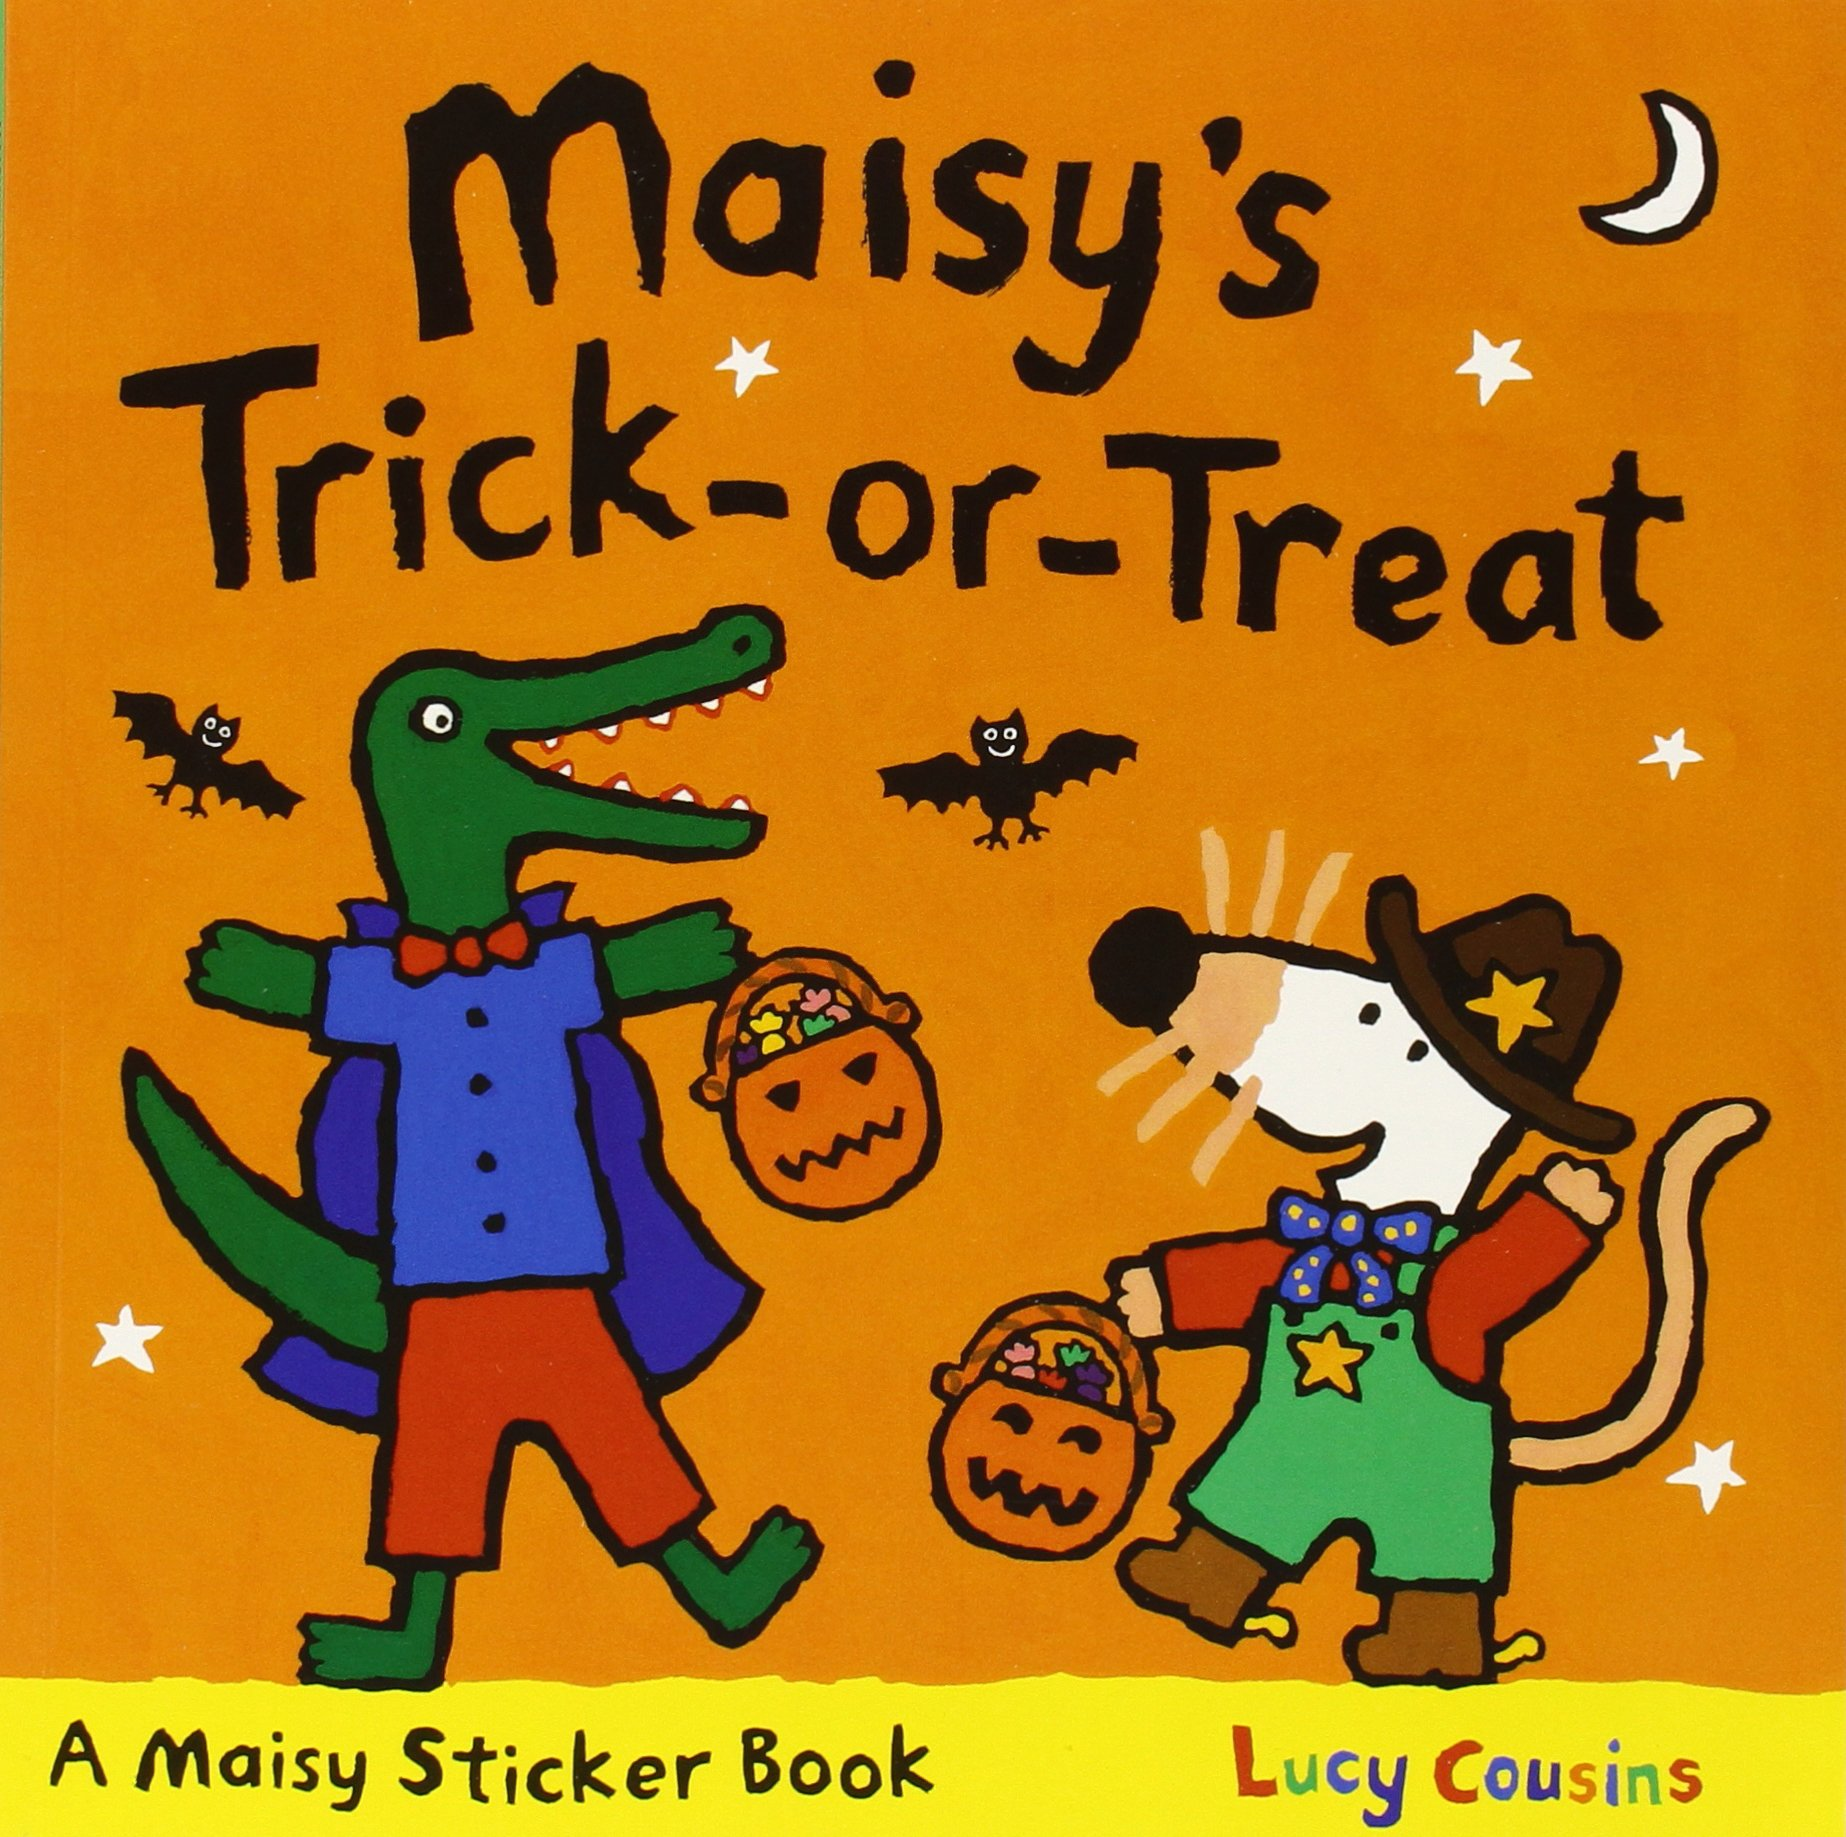 Maisy's Trick-or-Treat Sticker Book PDF